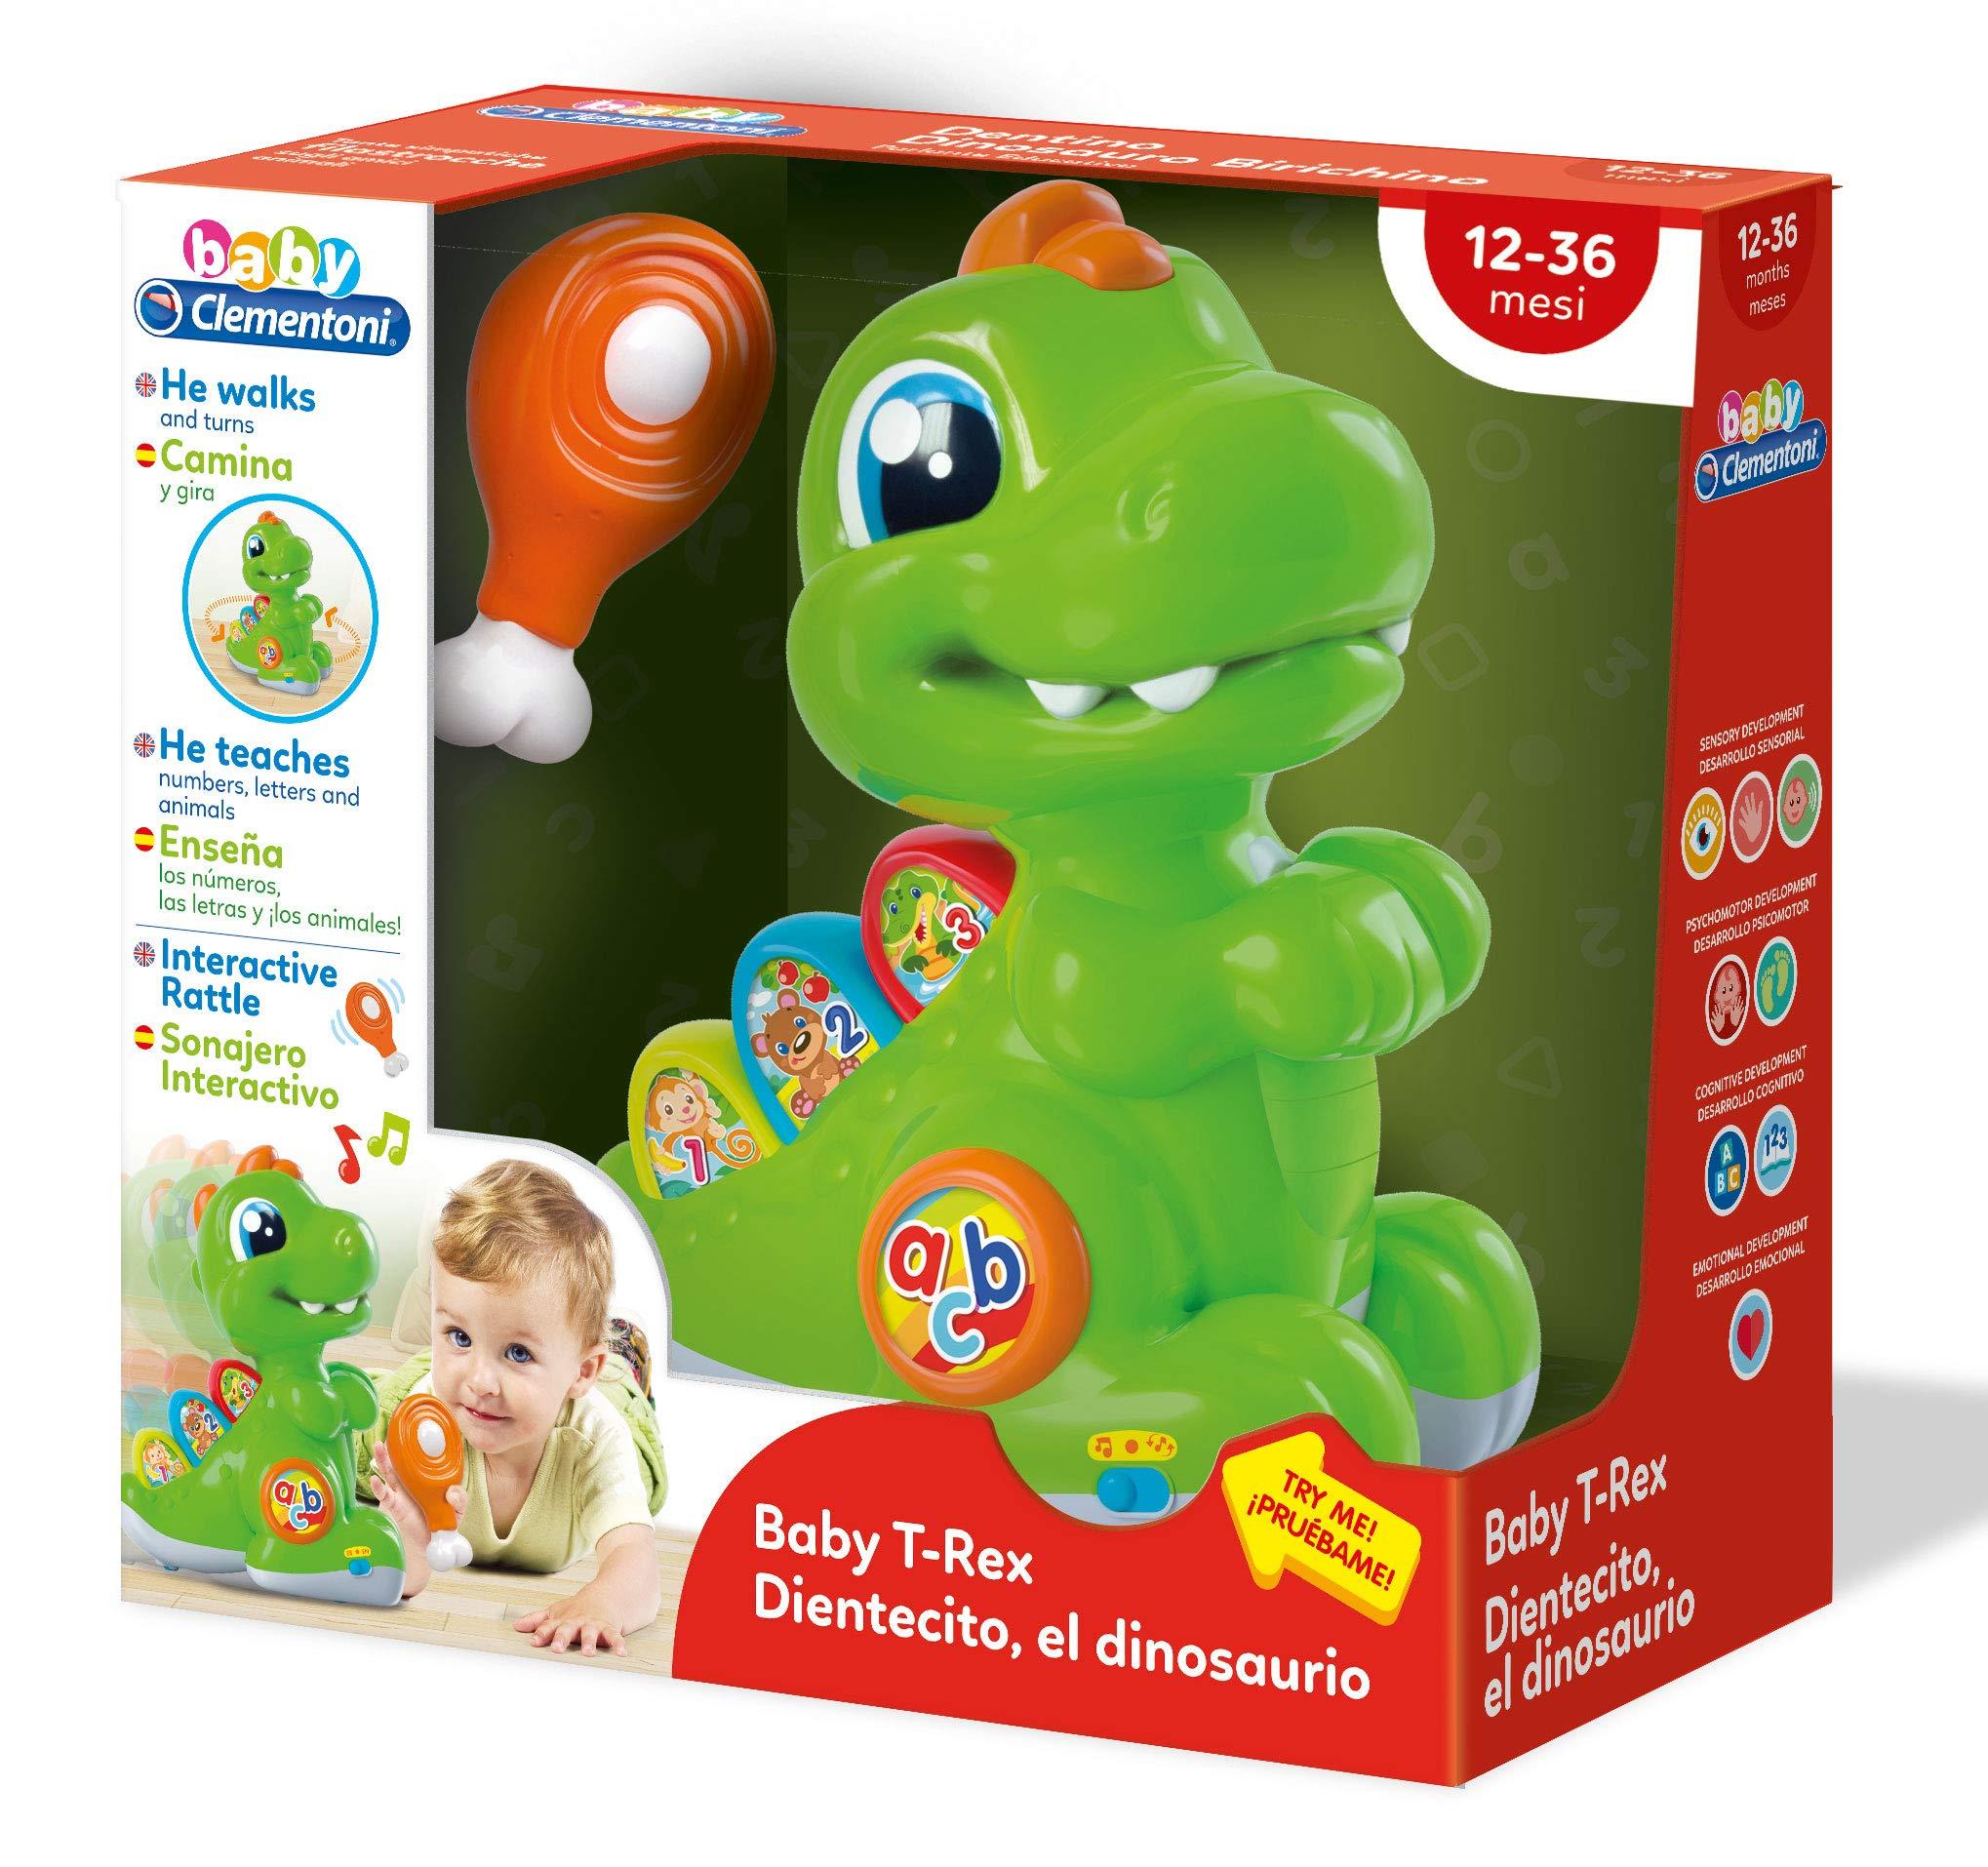 Clementoni - Baby Dientecito, Multicolor (Clementoni Spain 61602 ...